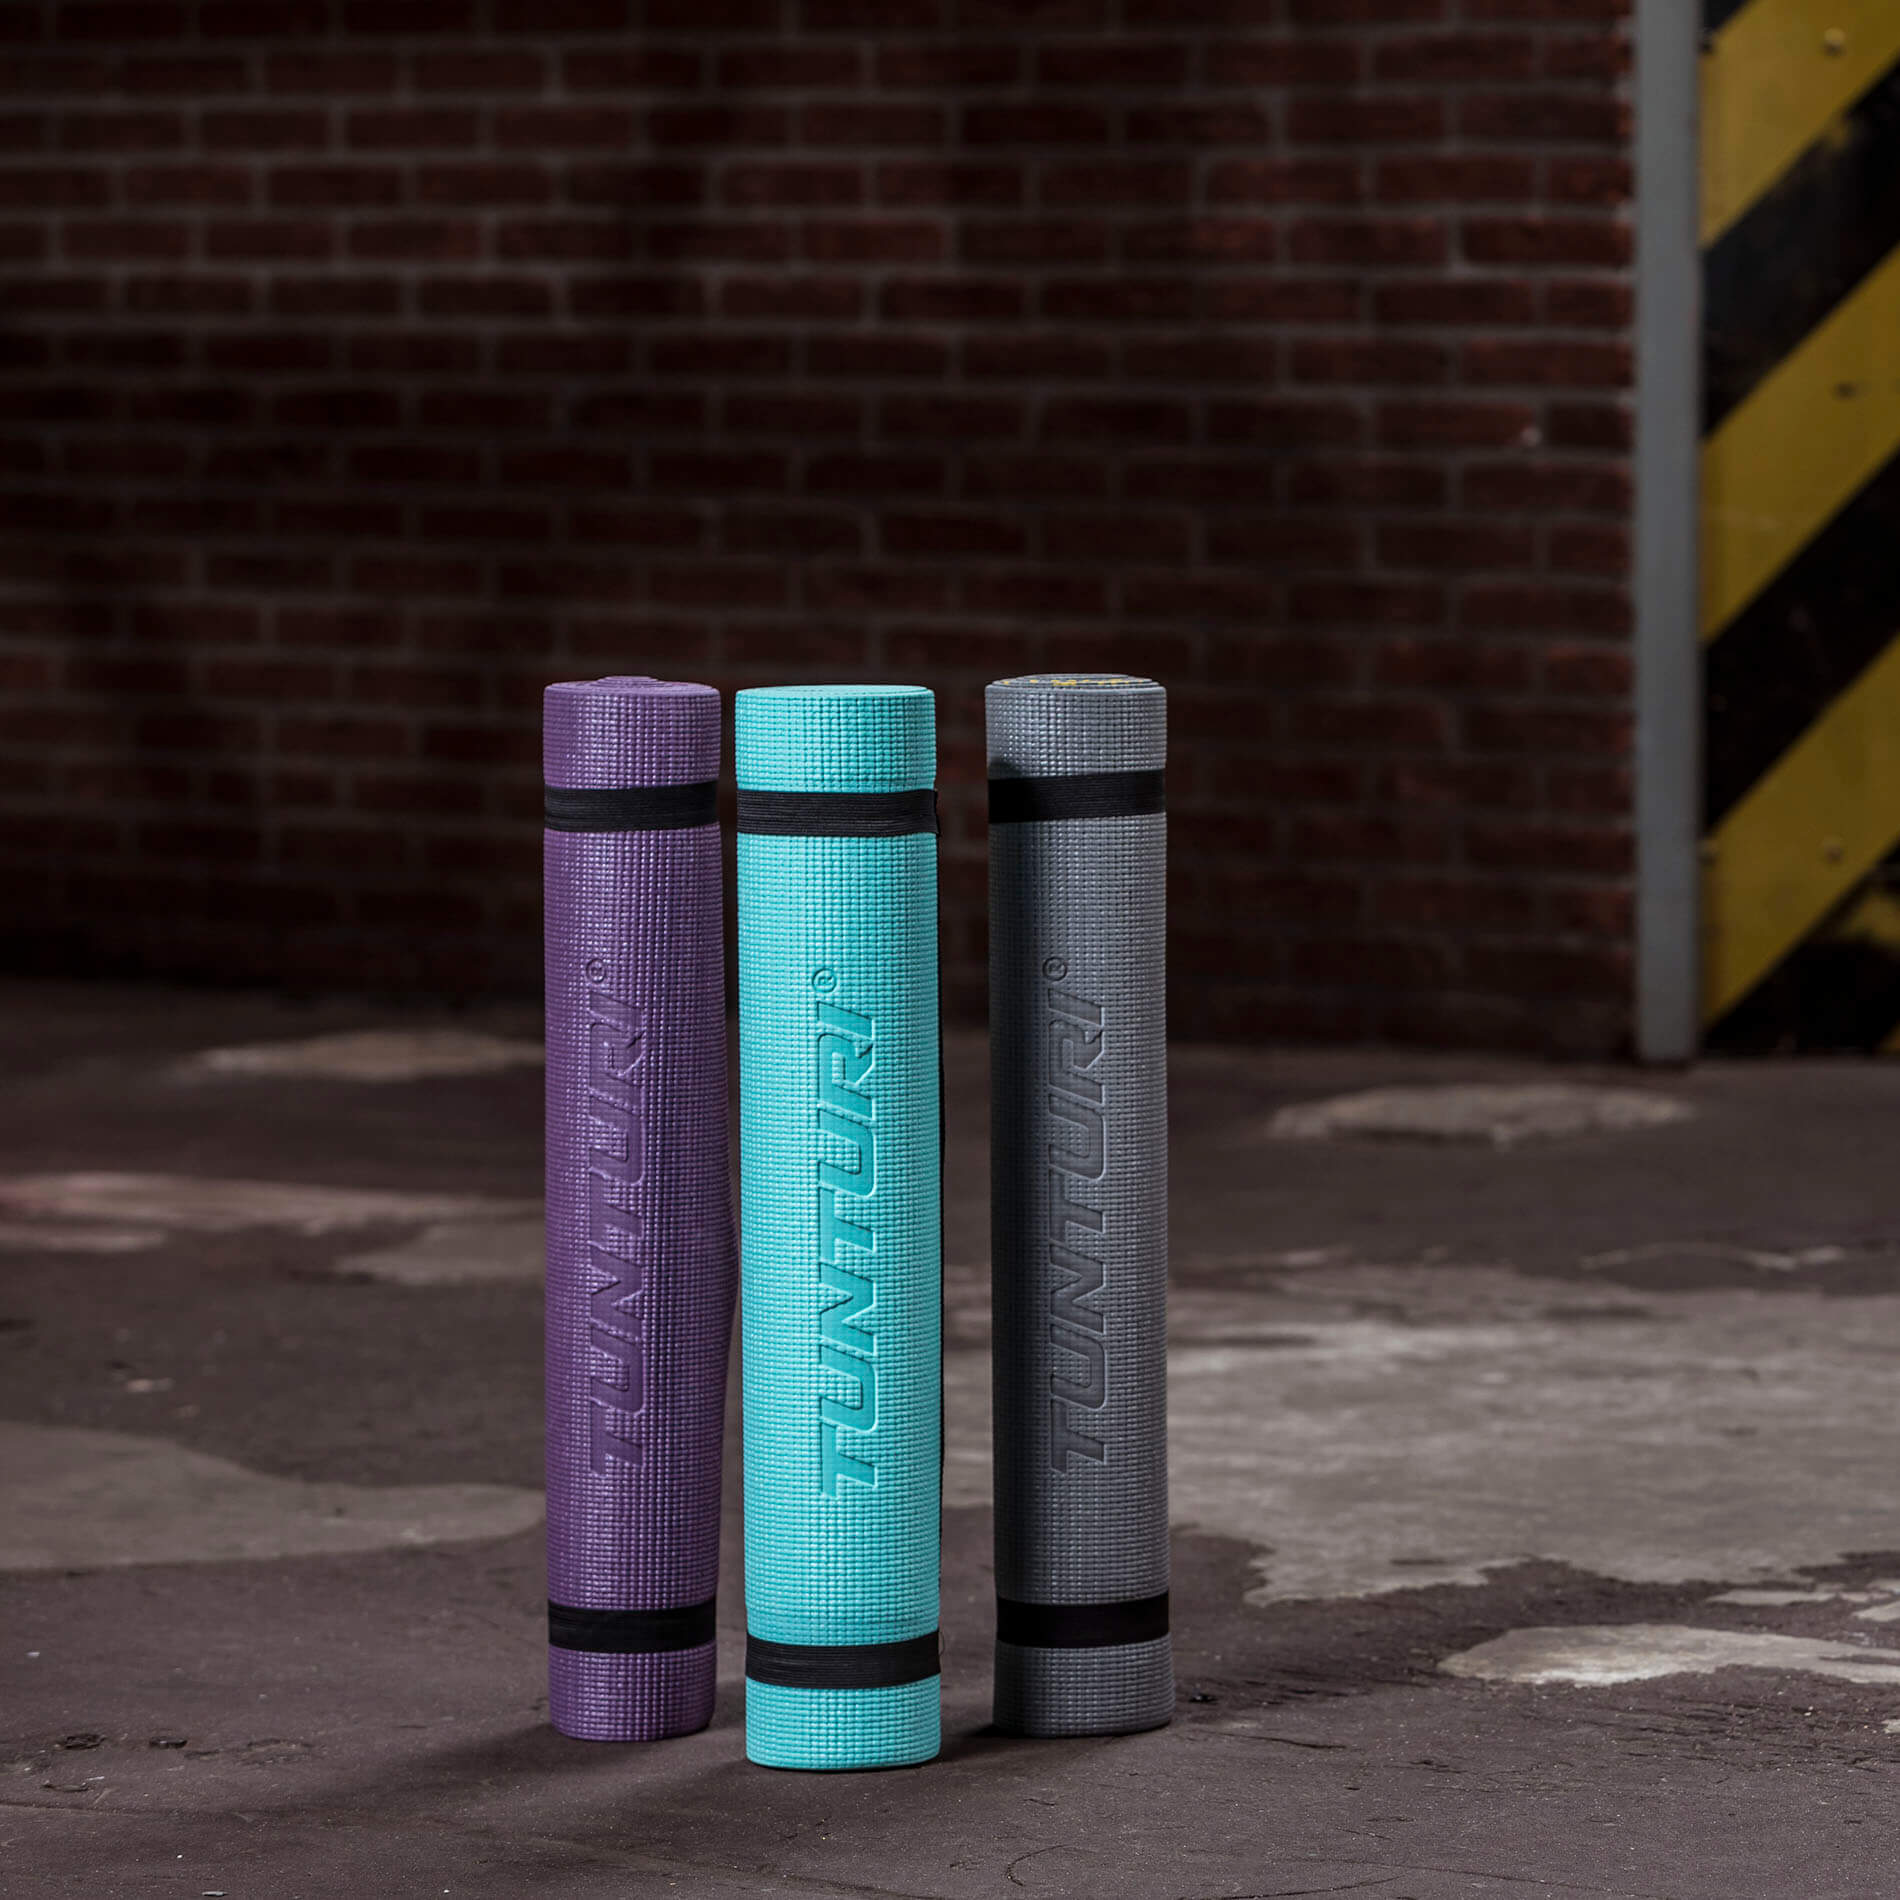 PVC Yogamat - Fitnessmat 4mm dik - Antraciet